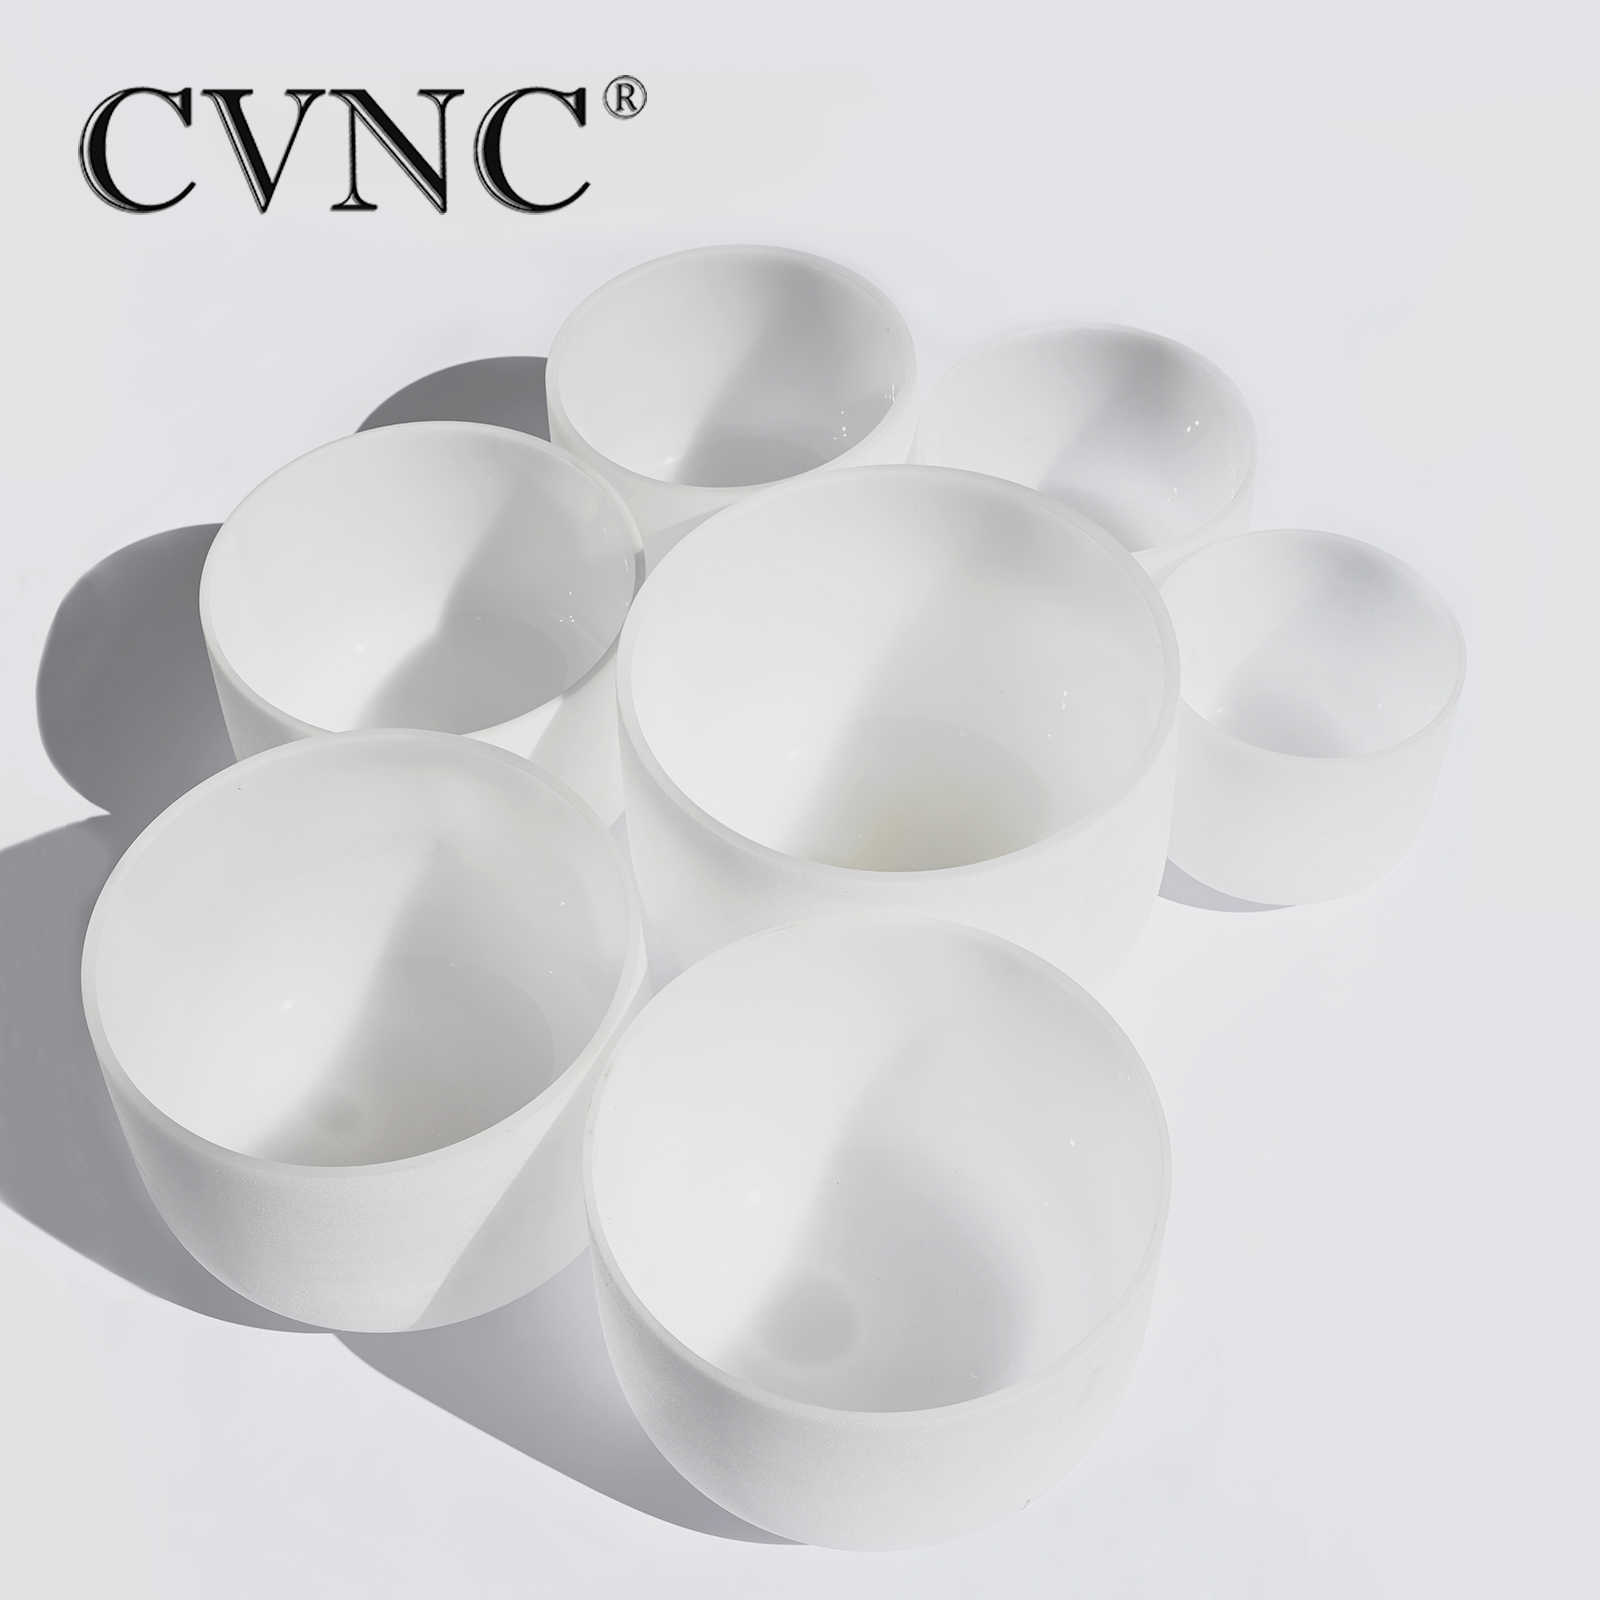 "CVNC Chakra настроенный Набор из 7 шт. 8 ""-14"" Note C D E F G A B матовый кварц 432 Гц кристалл поющая чаша"